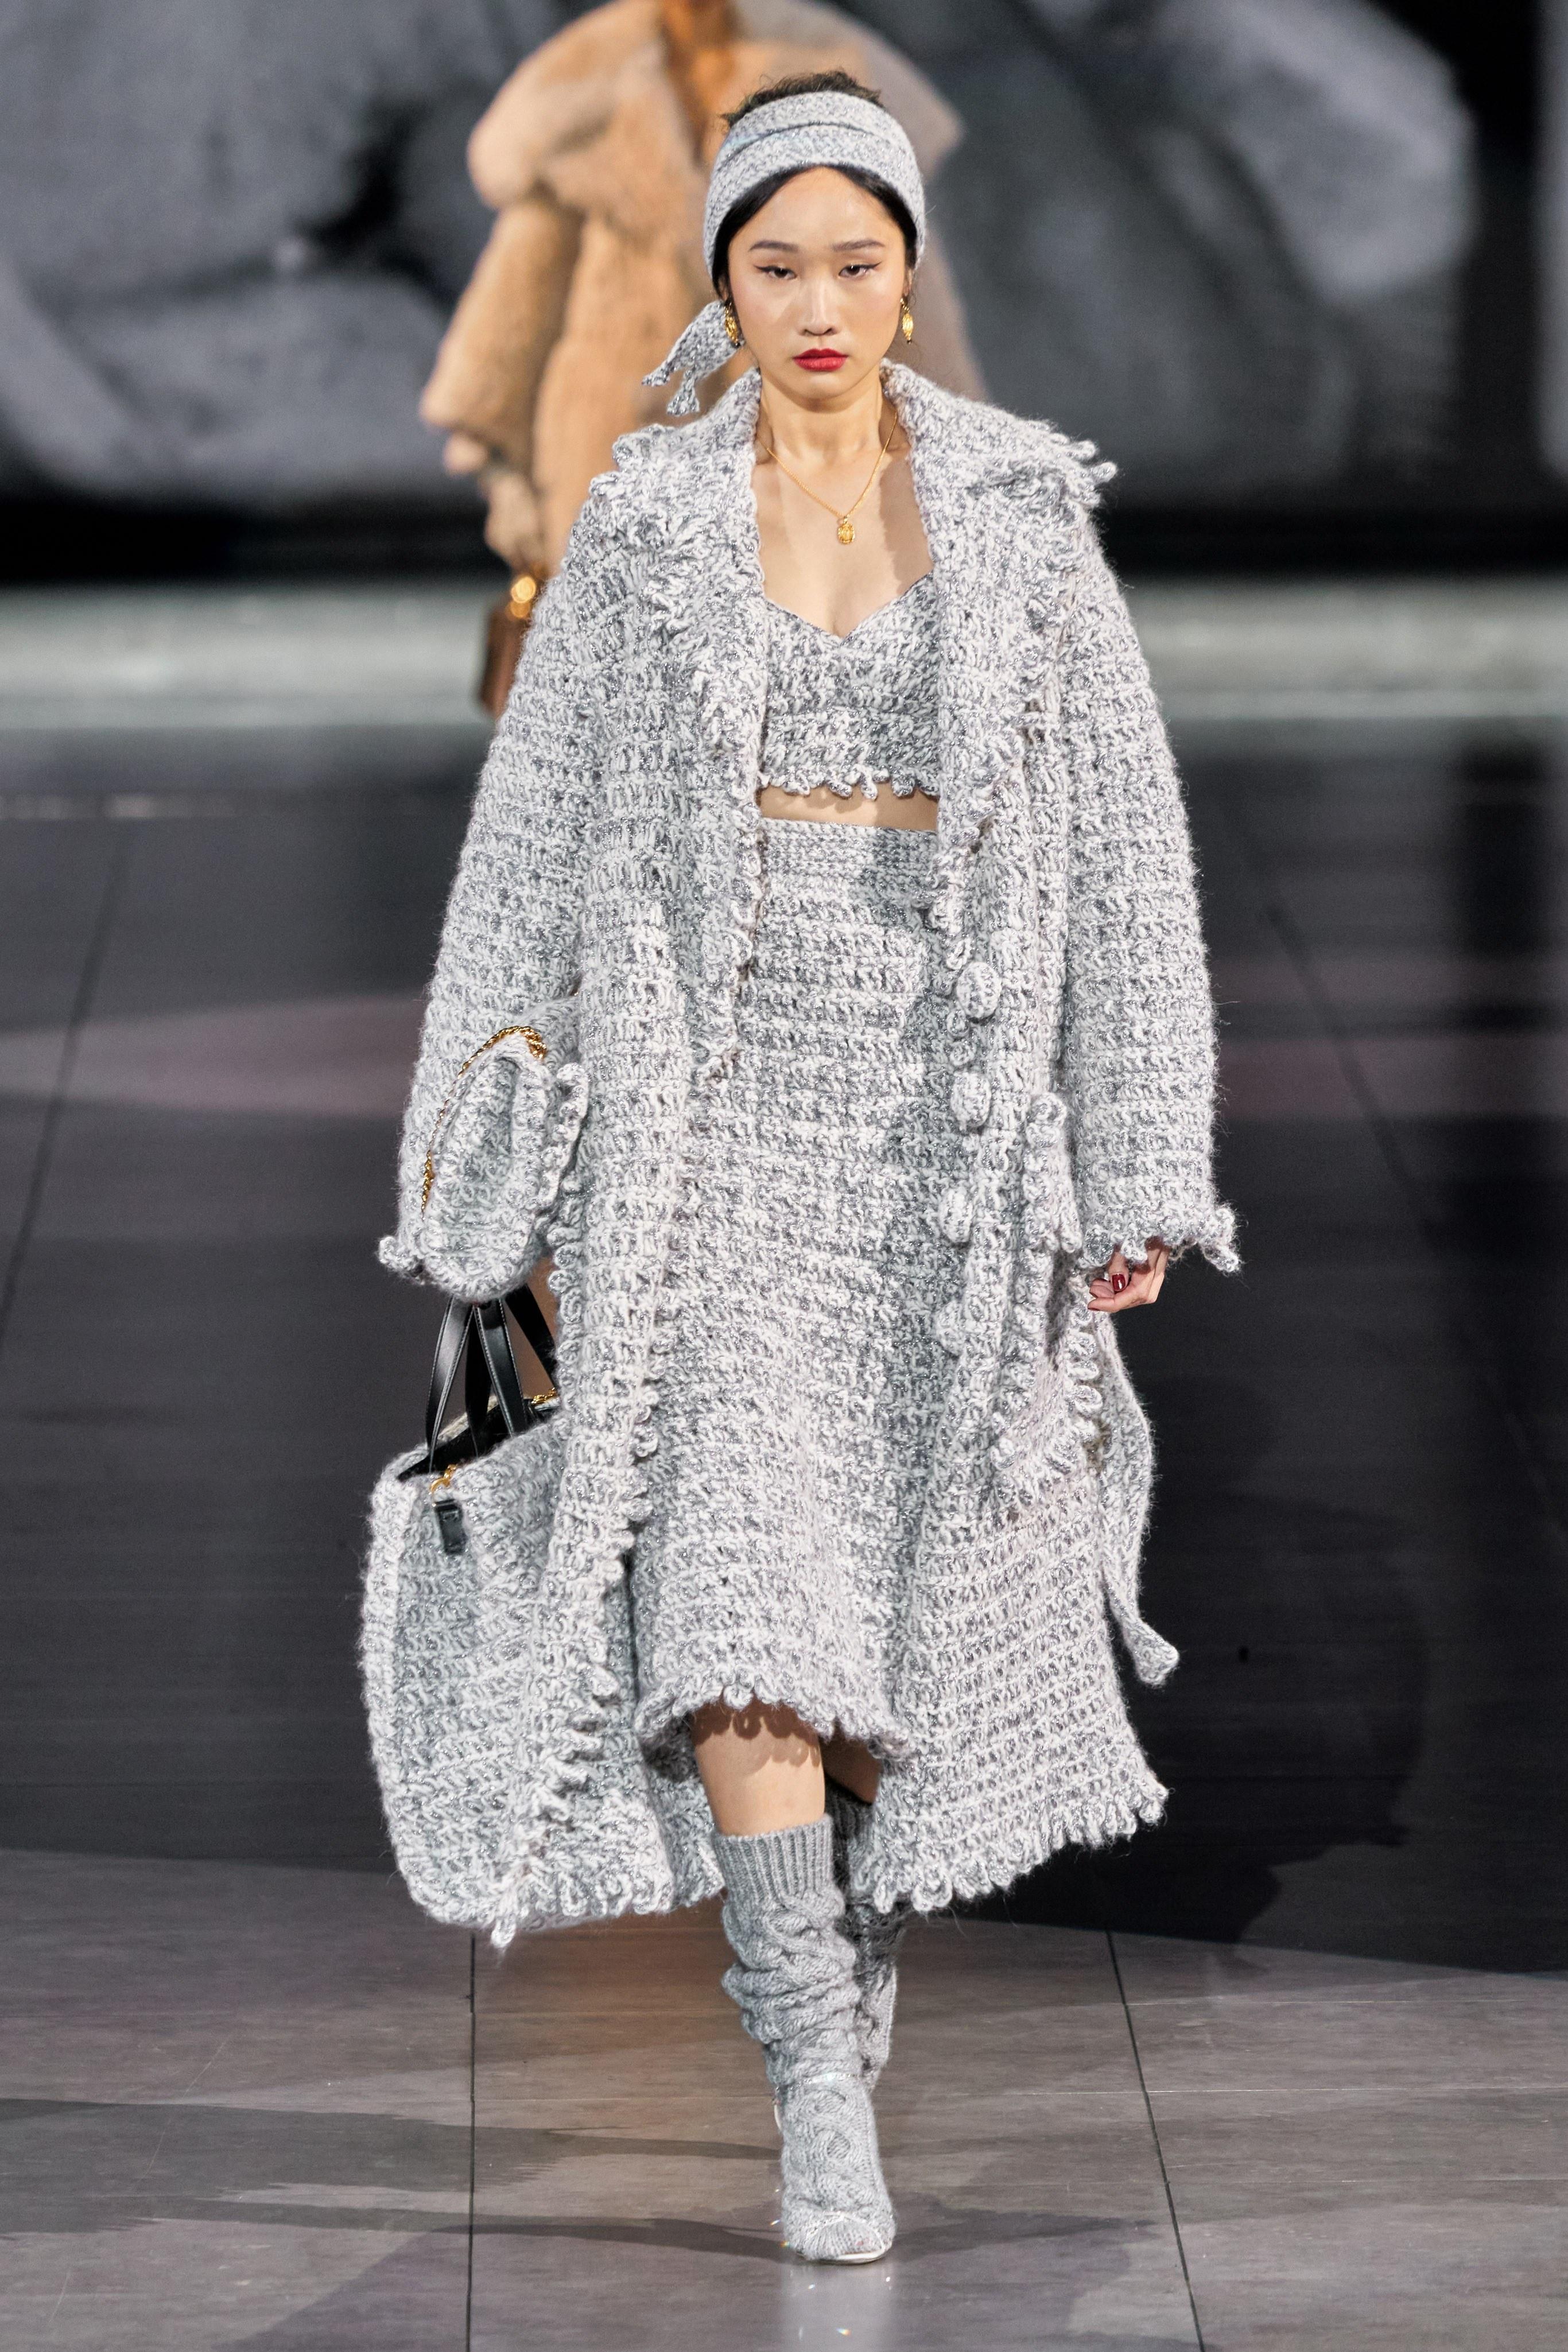 Khong co khach moi den Milan Fashion Week vi lo ngai virus corona hinh anh 46 ALE1133.jpg